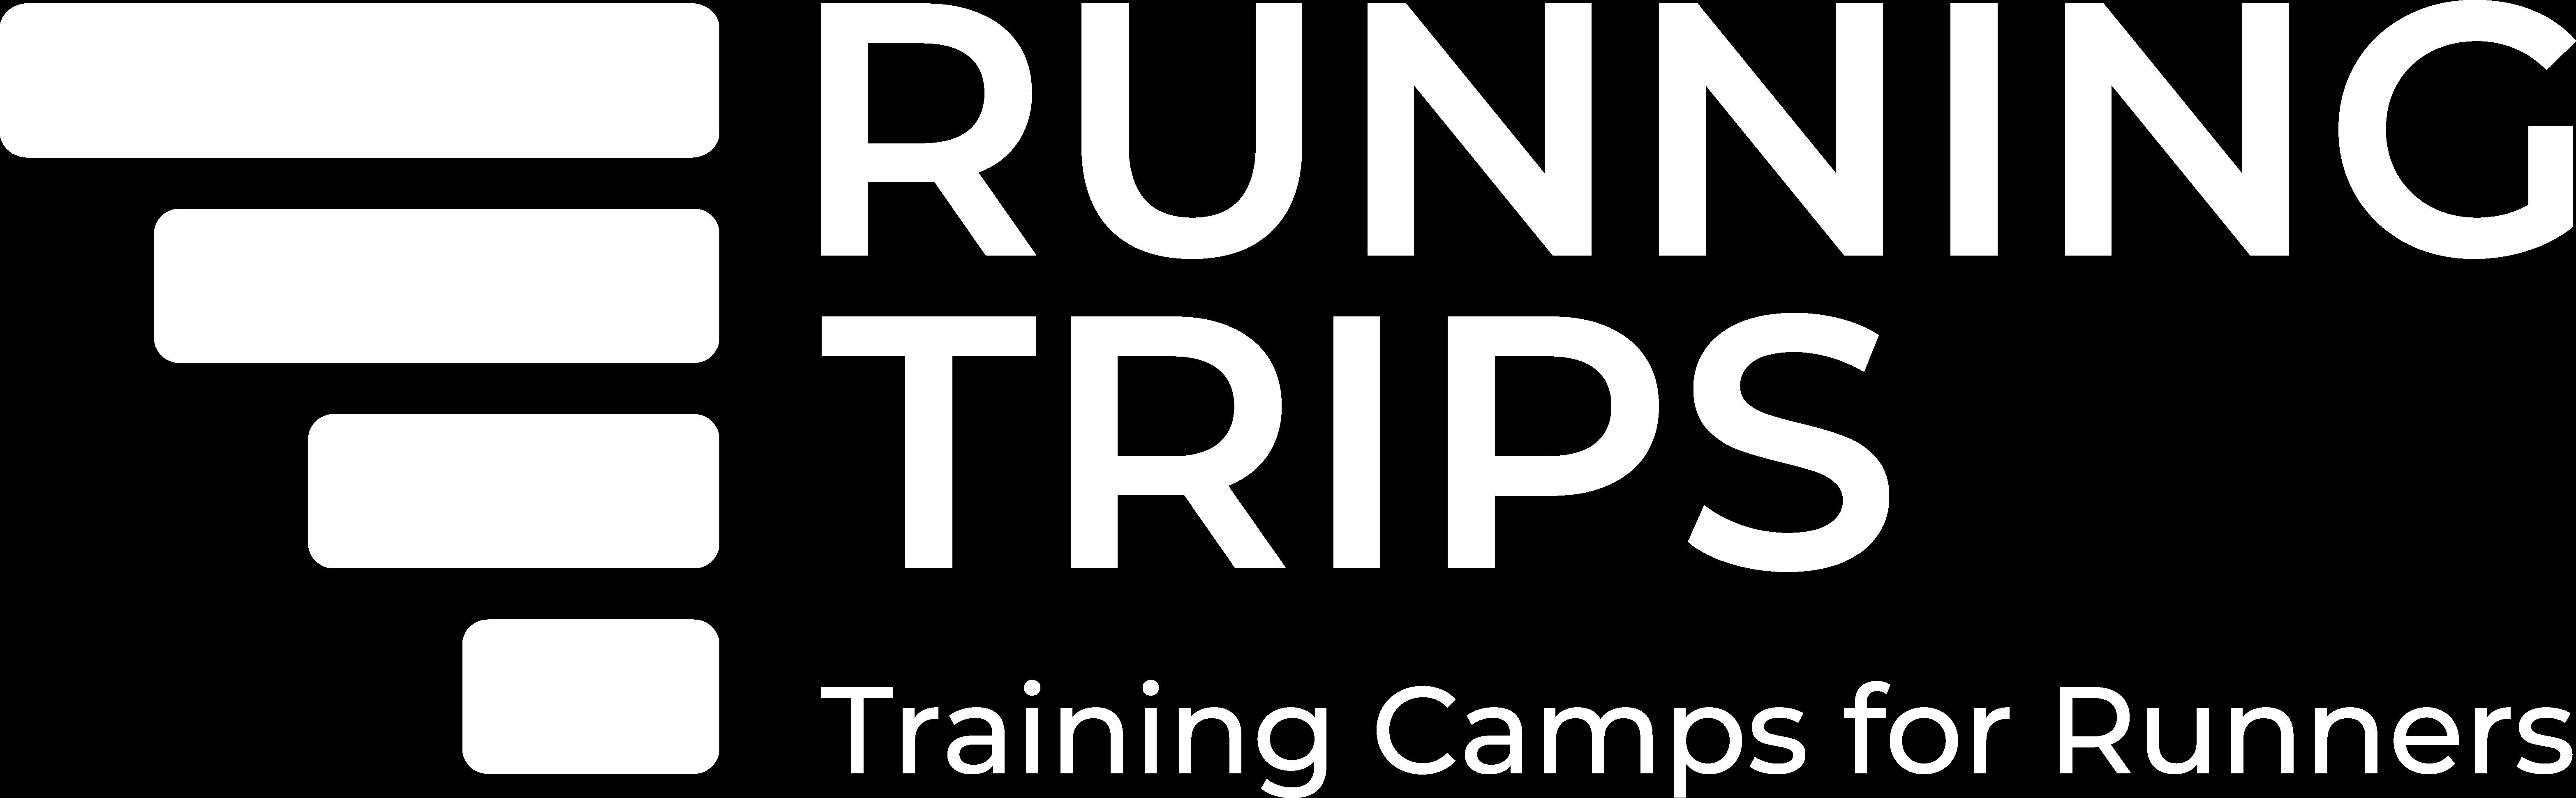 Running Trips